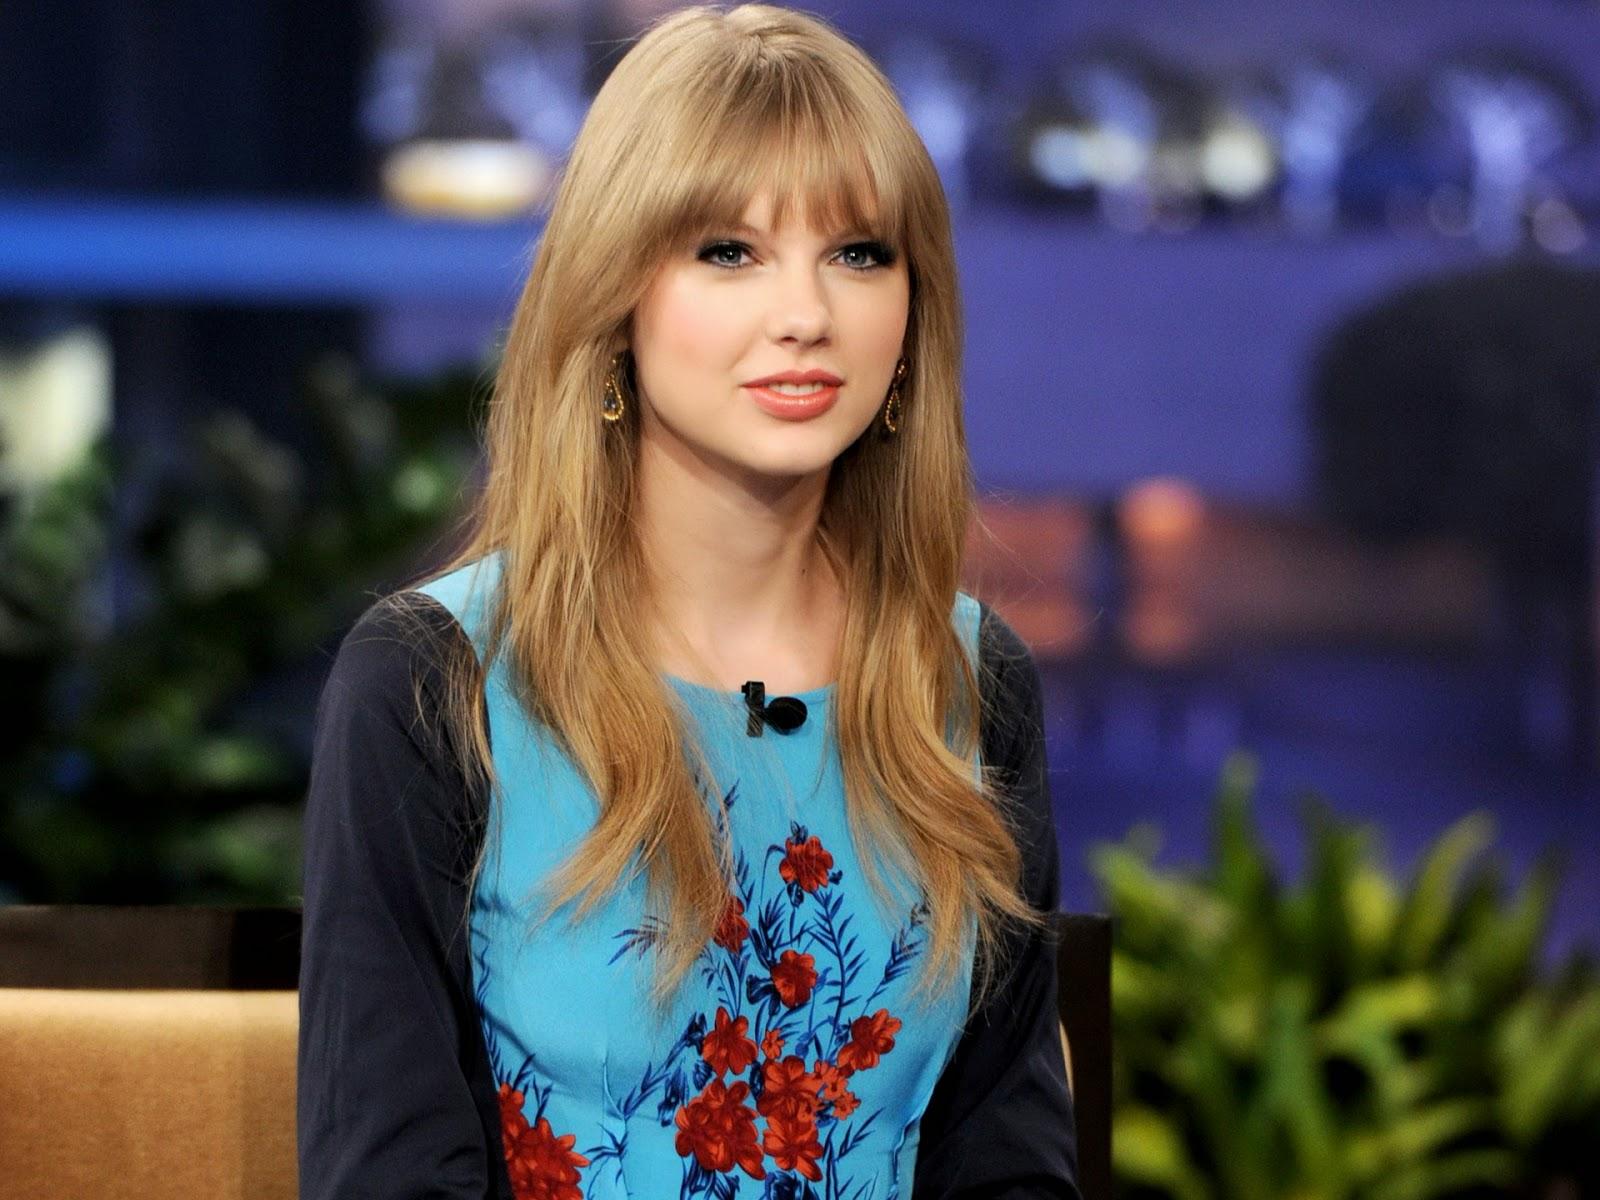 Taylor Swift Sexy Photos